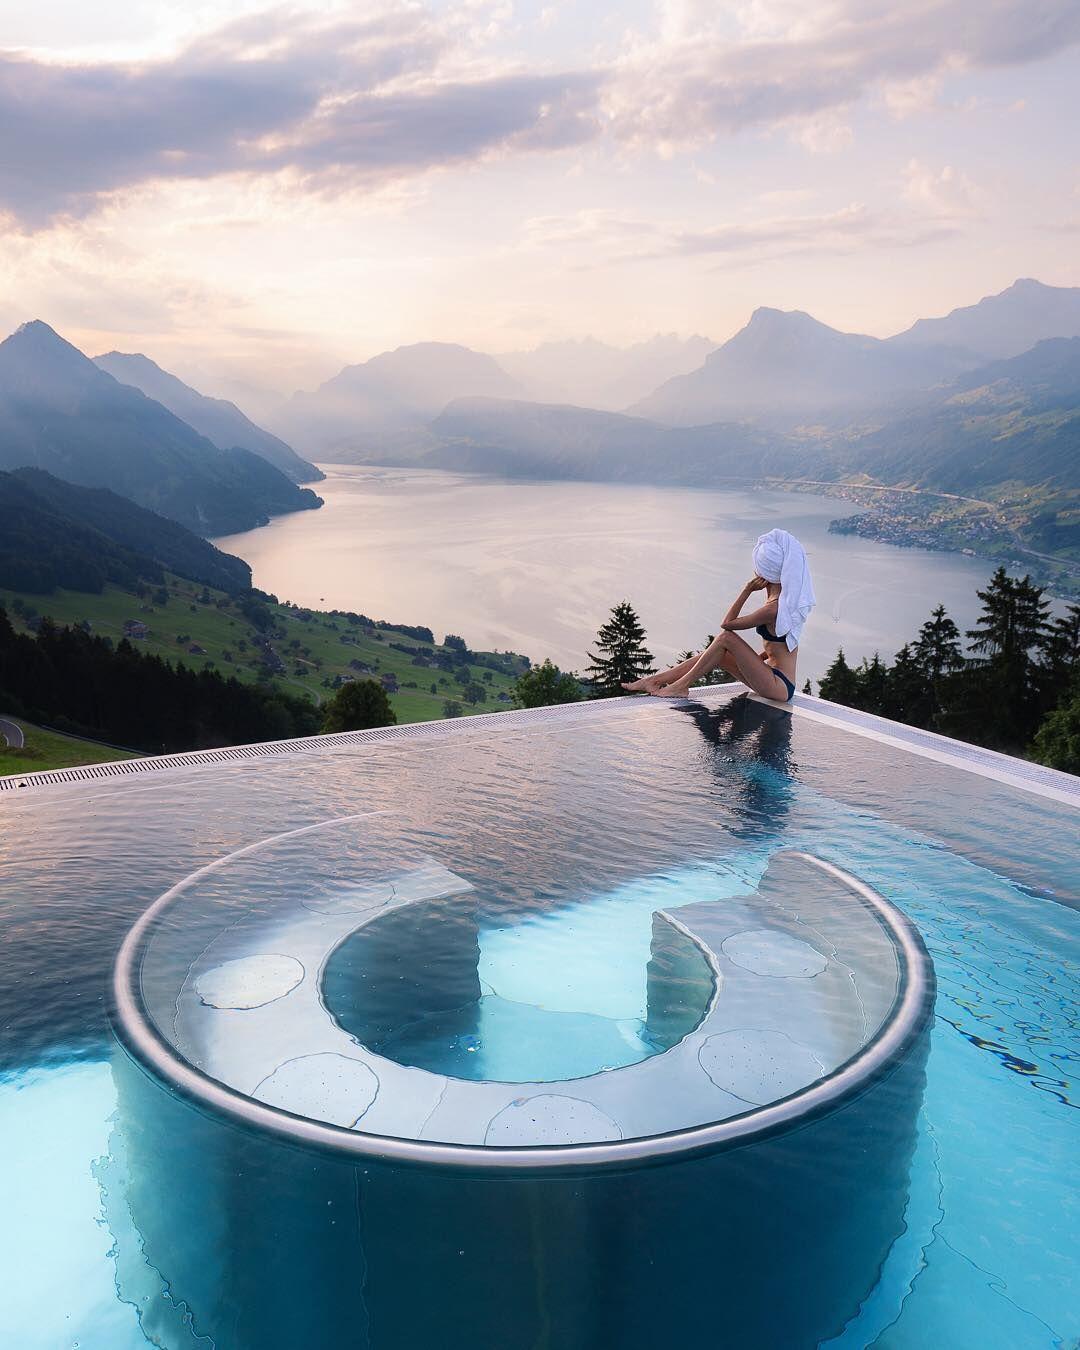 Best Hotel In Switzerland With Infinity Pool Sunrise Pool Views At Villa Honegg Regram Via Jess Wandering Travel Vacation Bucketlist Switzerland Epic Pools Villa Honegg Hotel Villa Honegg